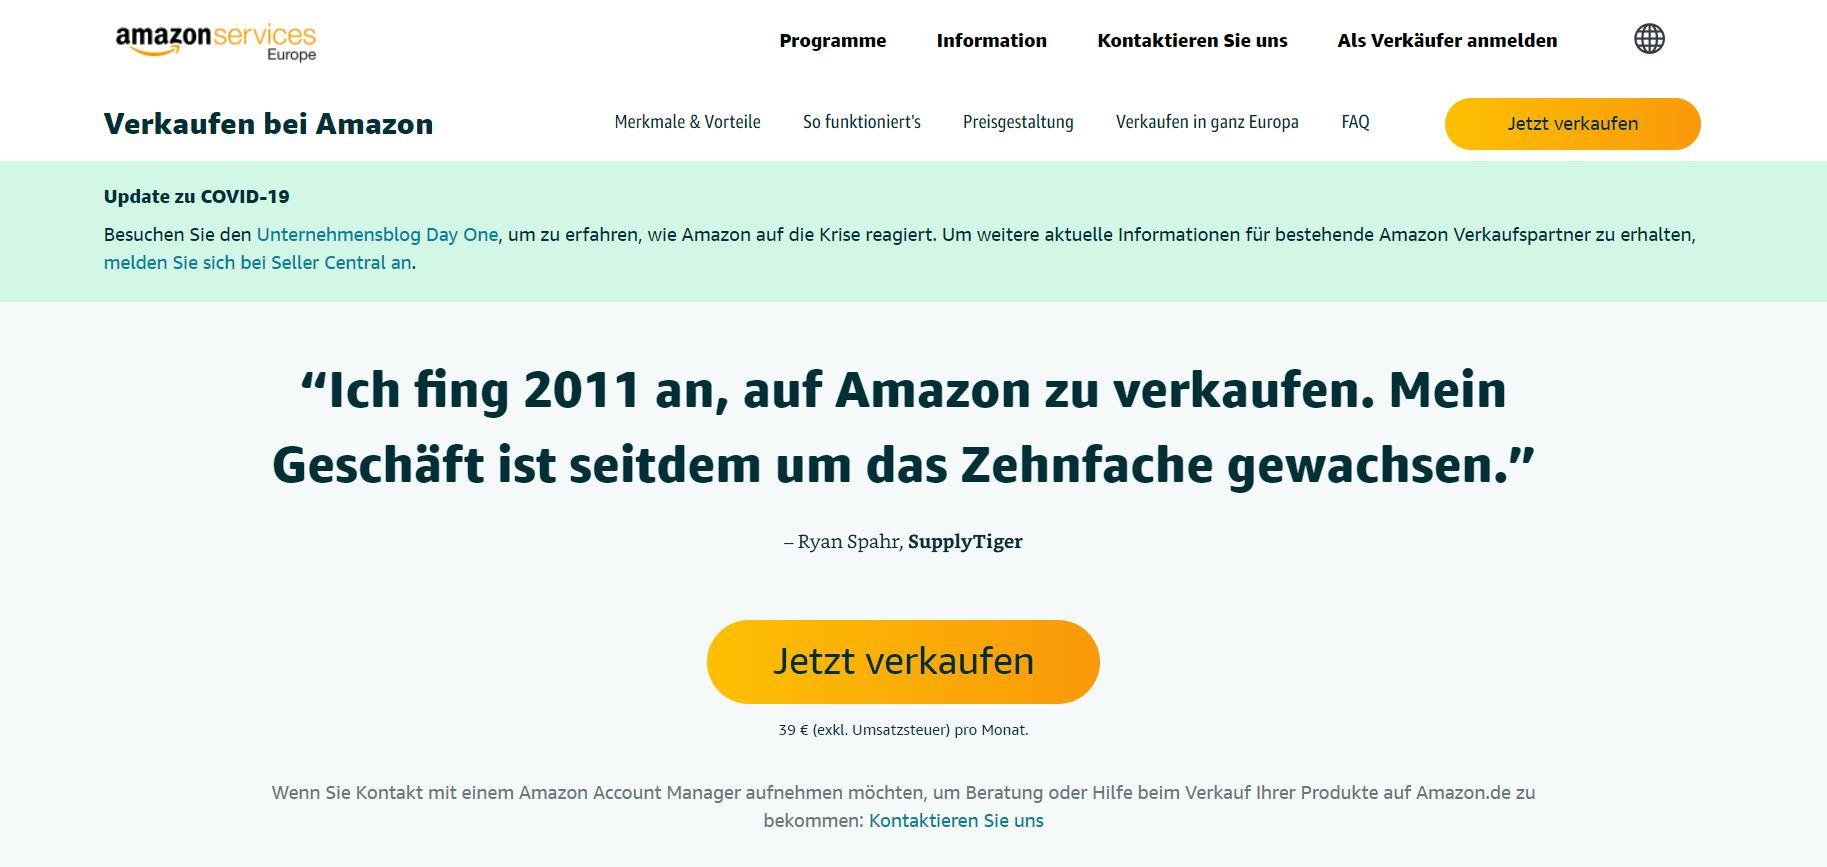 Bei Amazon verkaufen - Anmeldung